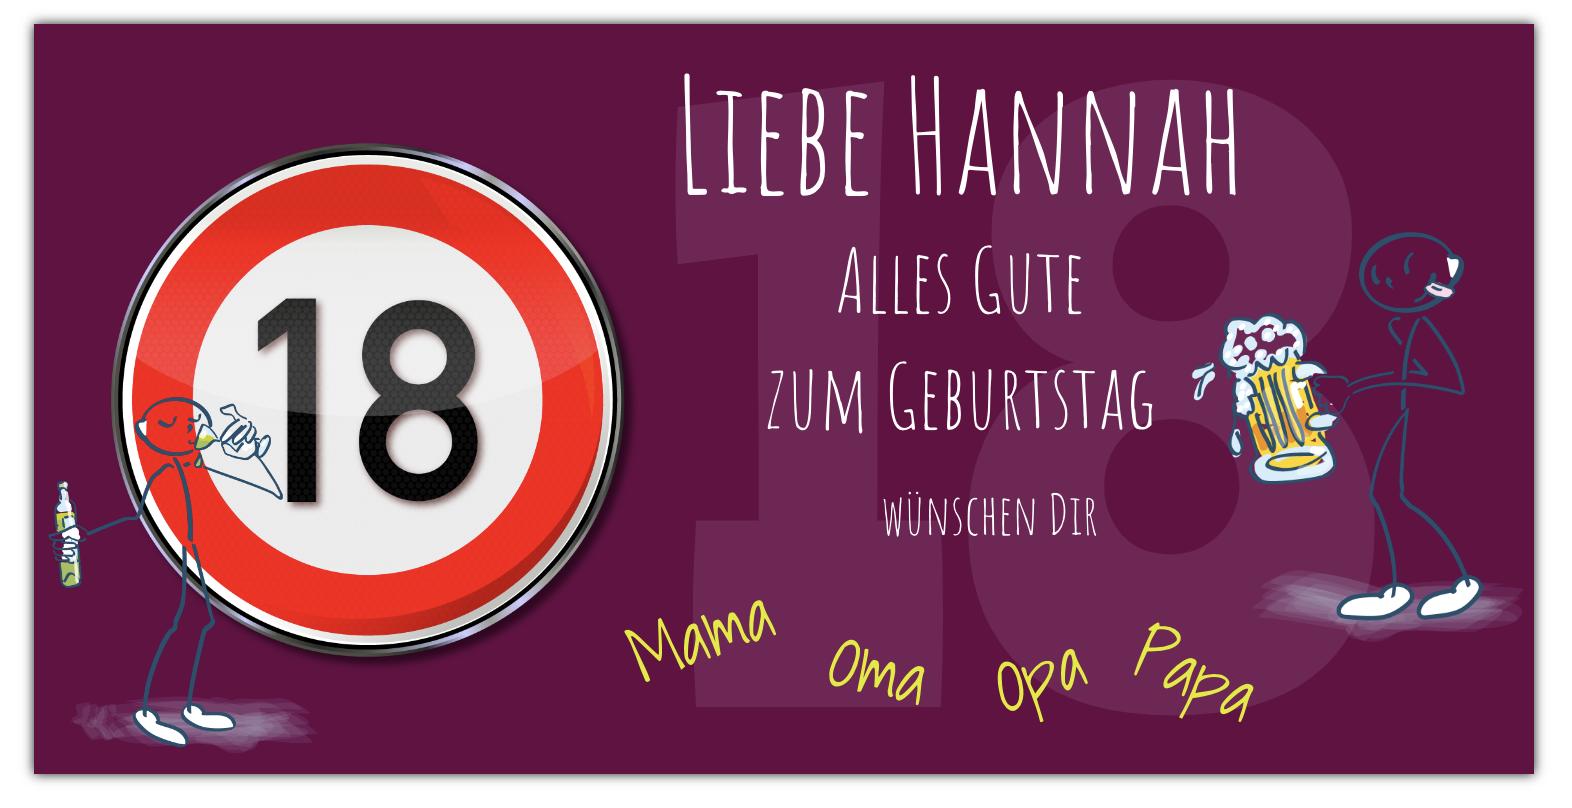 18 Geburtstags Banner Online Selbst Gestalten Geburtstagsbanner Gluckwunsche Zum 30 Geburtstag Geburtstag